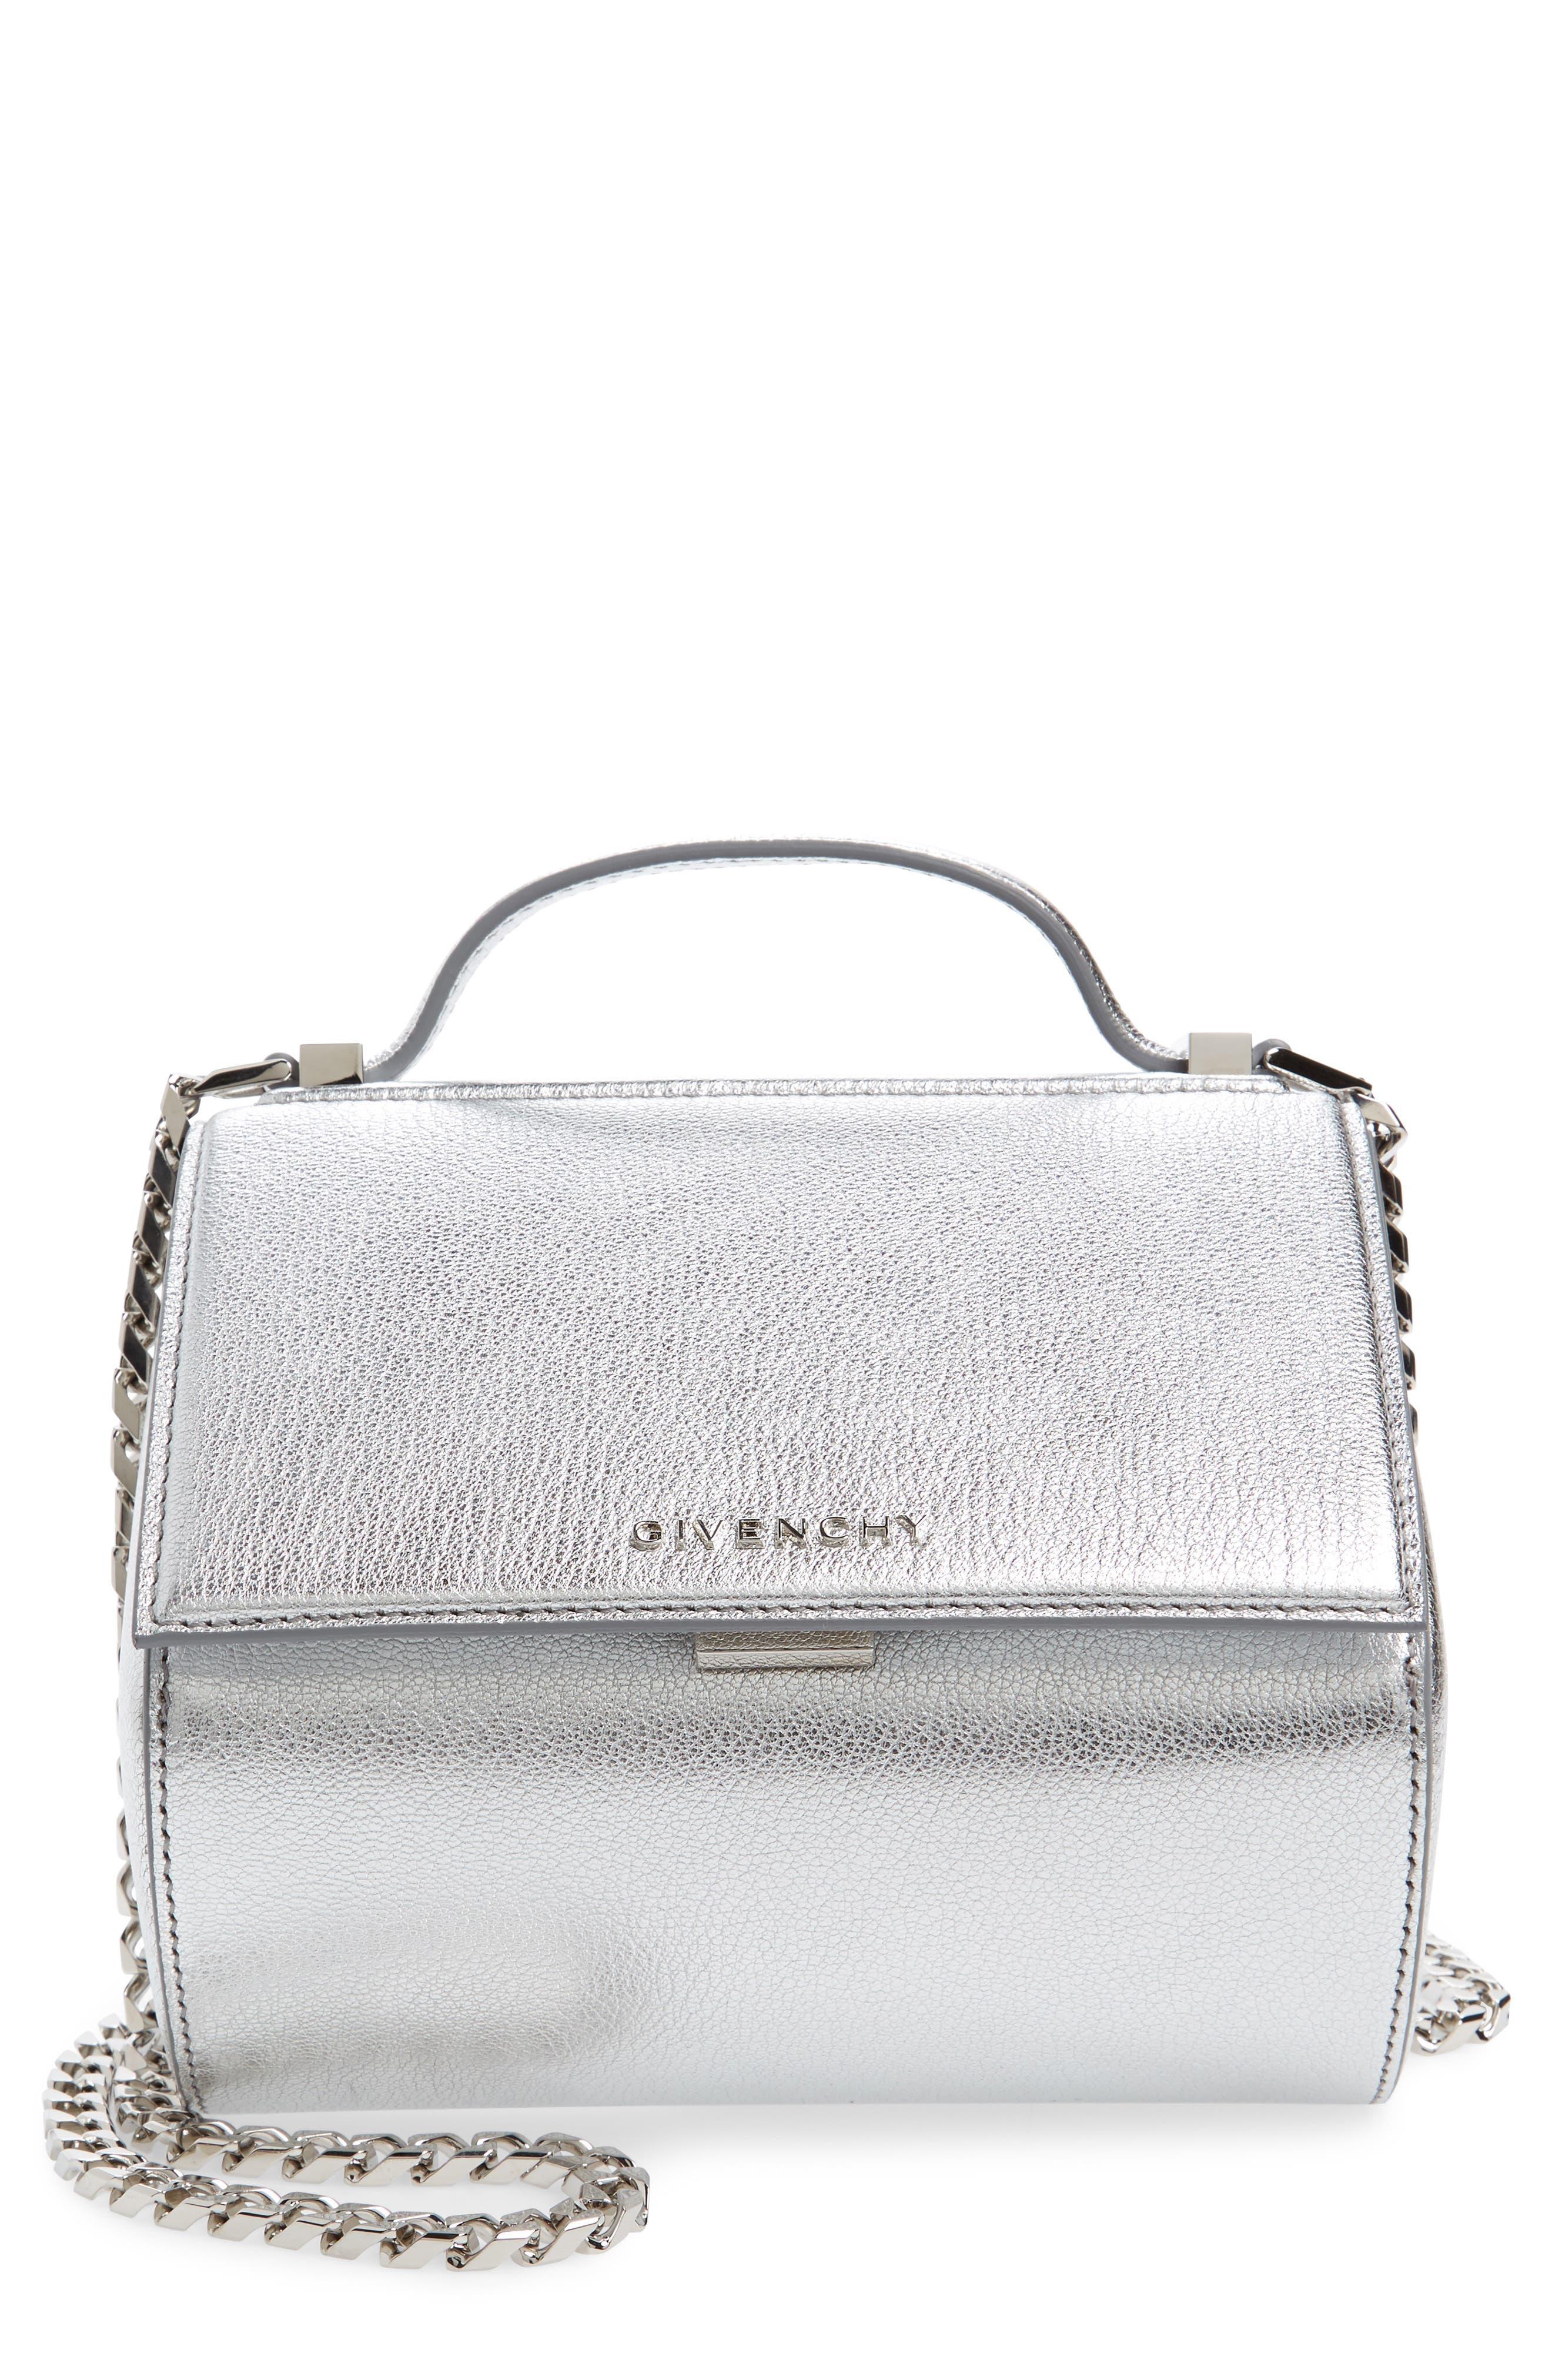 Main Image - Givenchy Pandora Metallic Leather Satchel